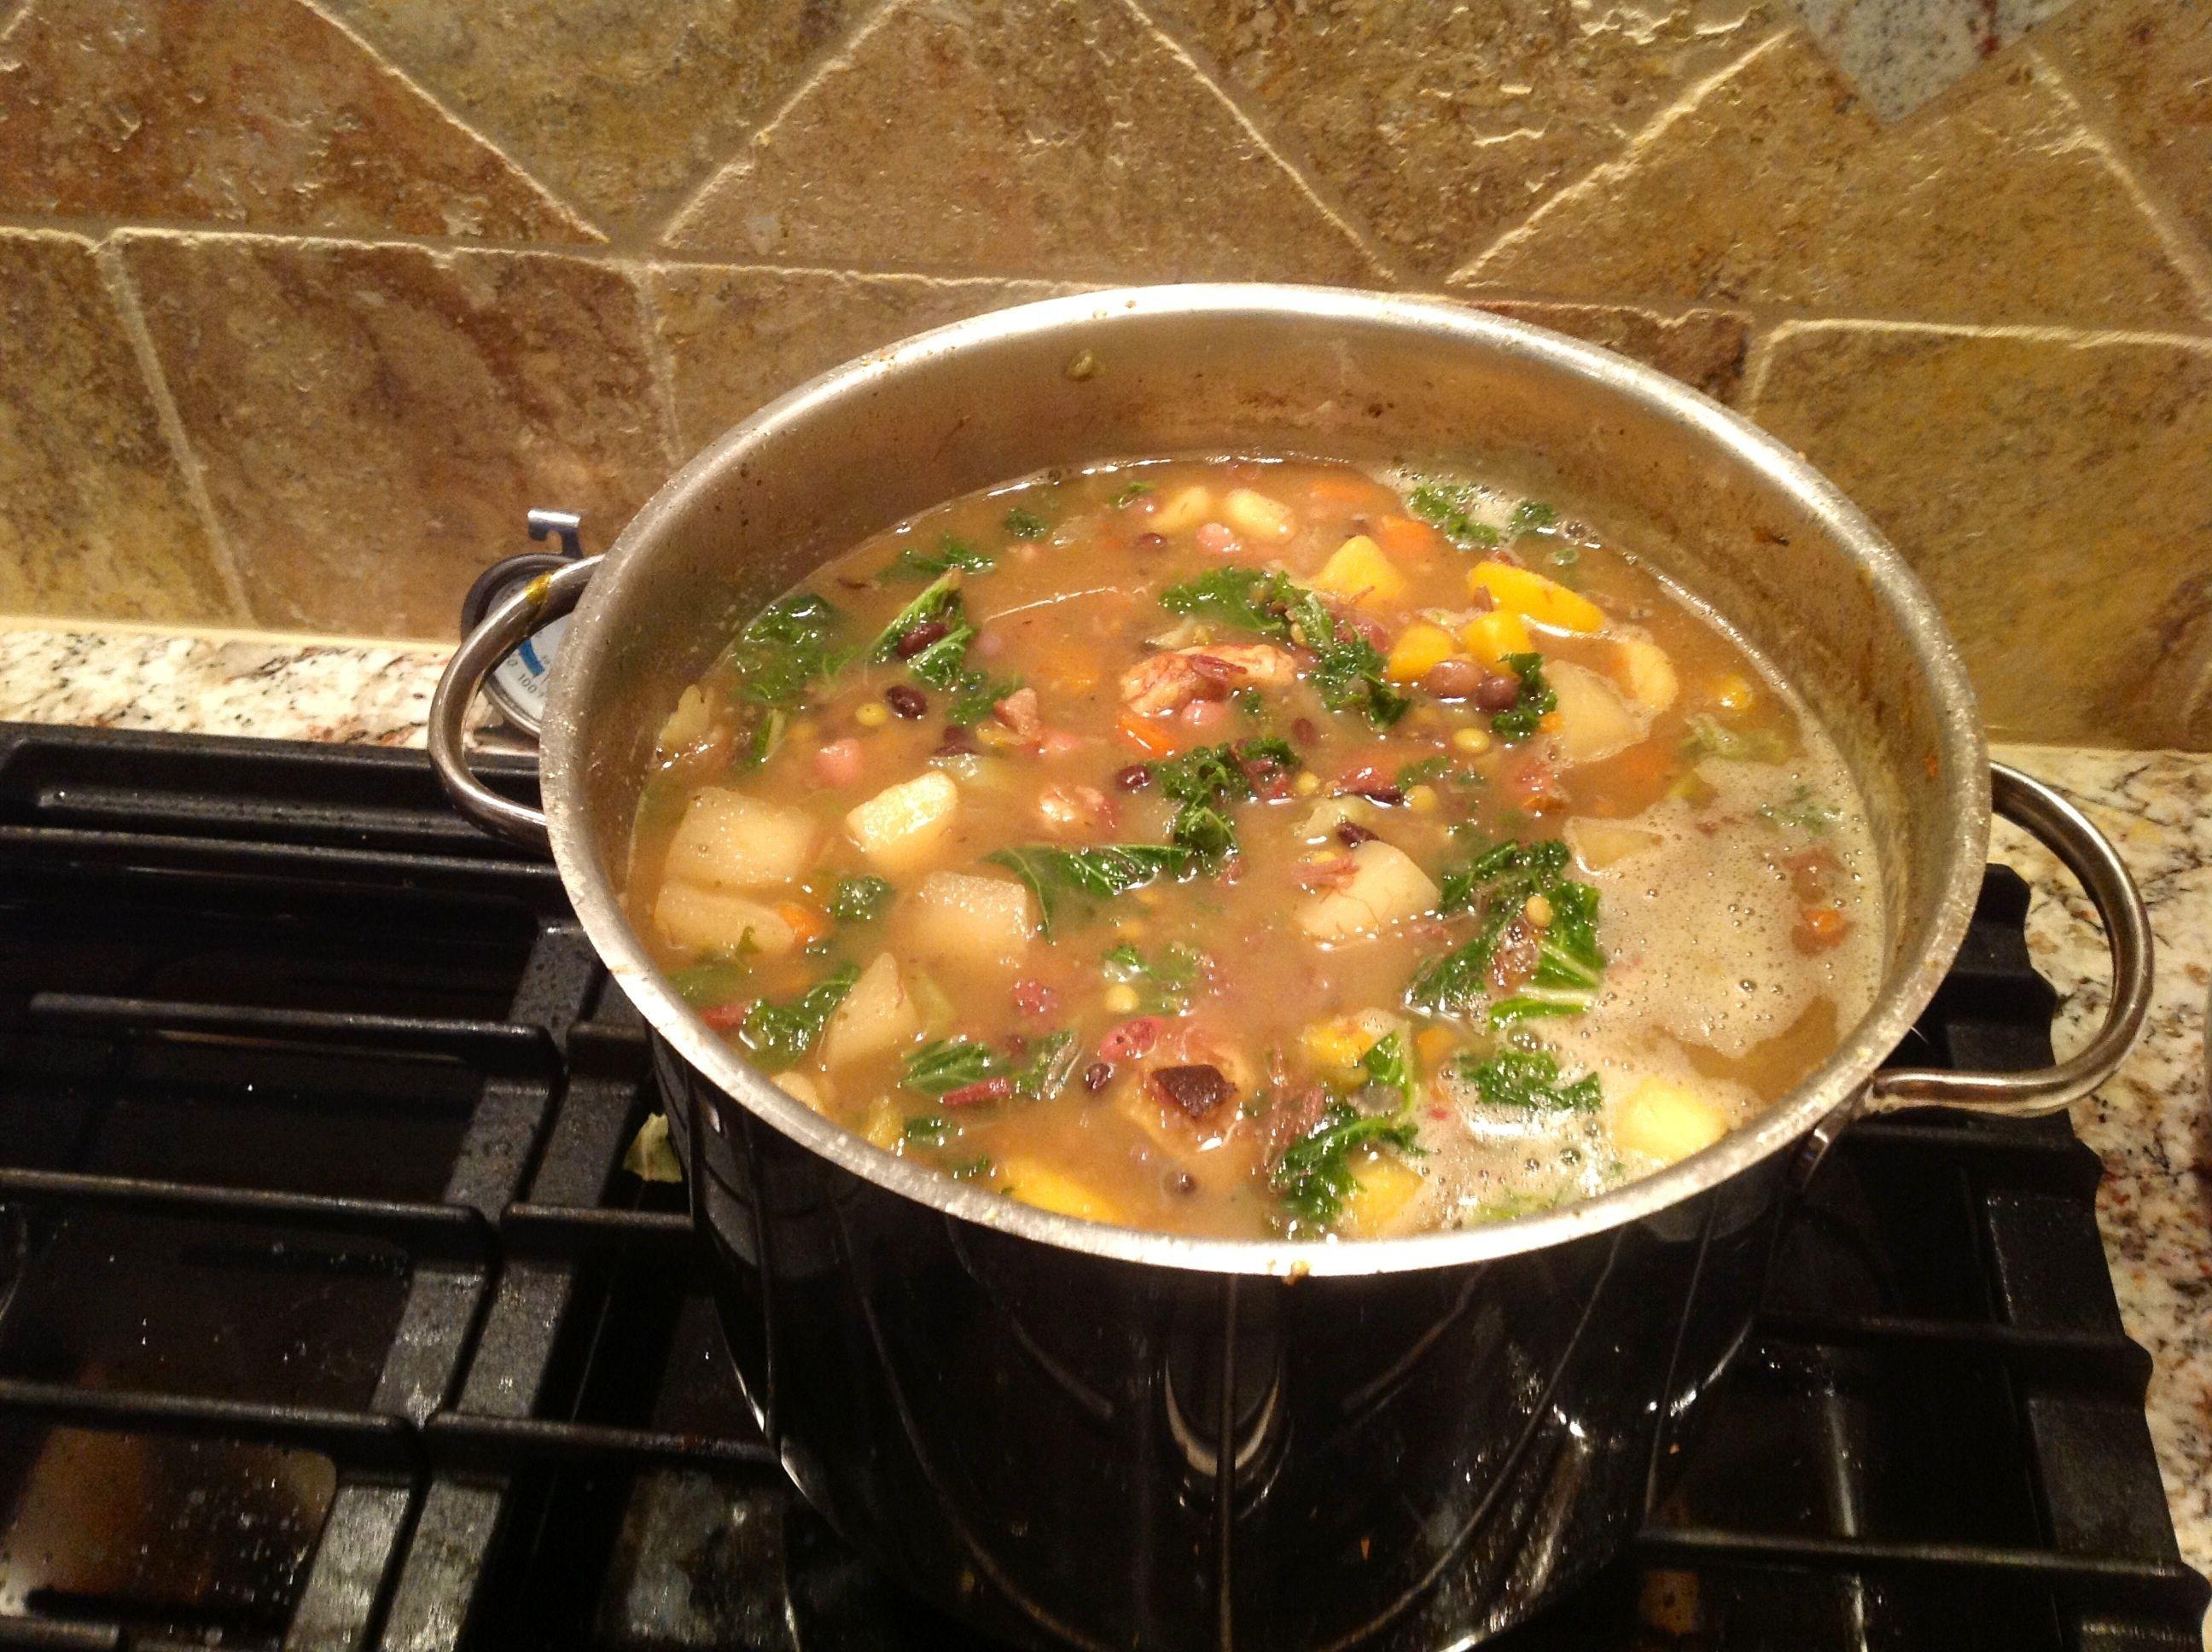 Smoked ham hock, bean, garden vegetable and kale soup. So good ...